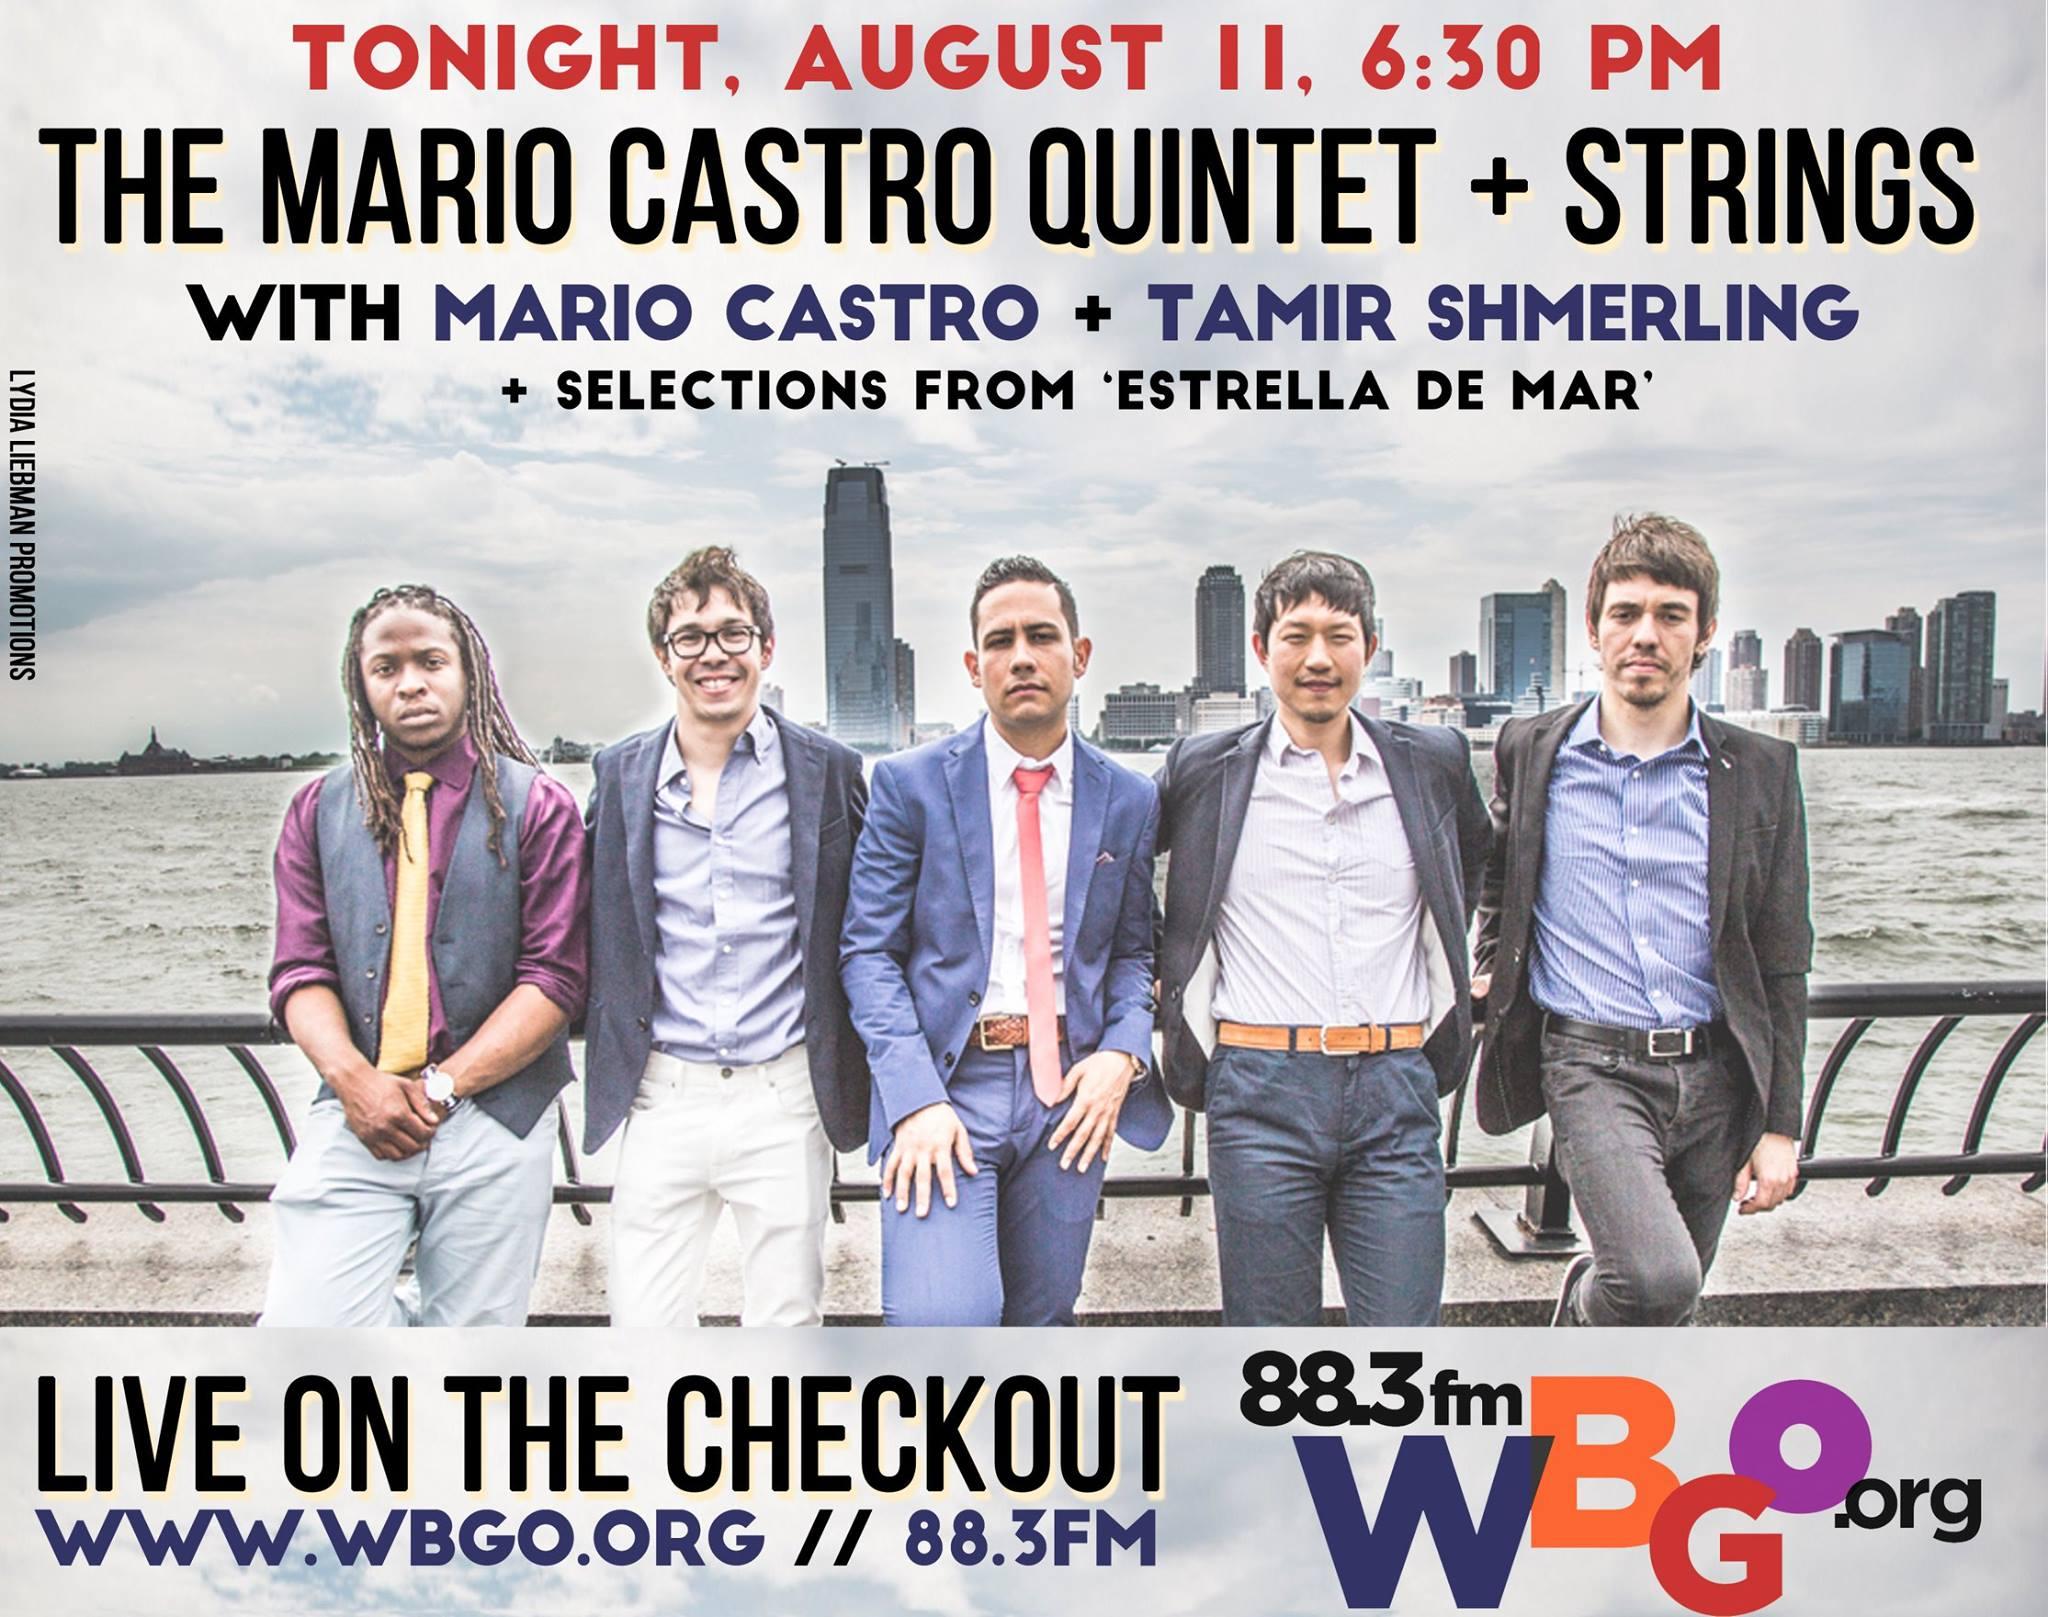 Mario Castro on WBGO's The Checkout TONIGHT!